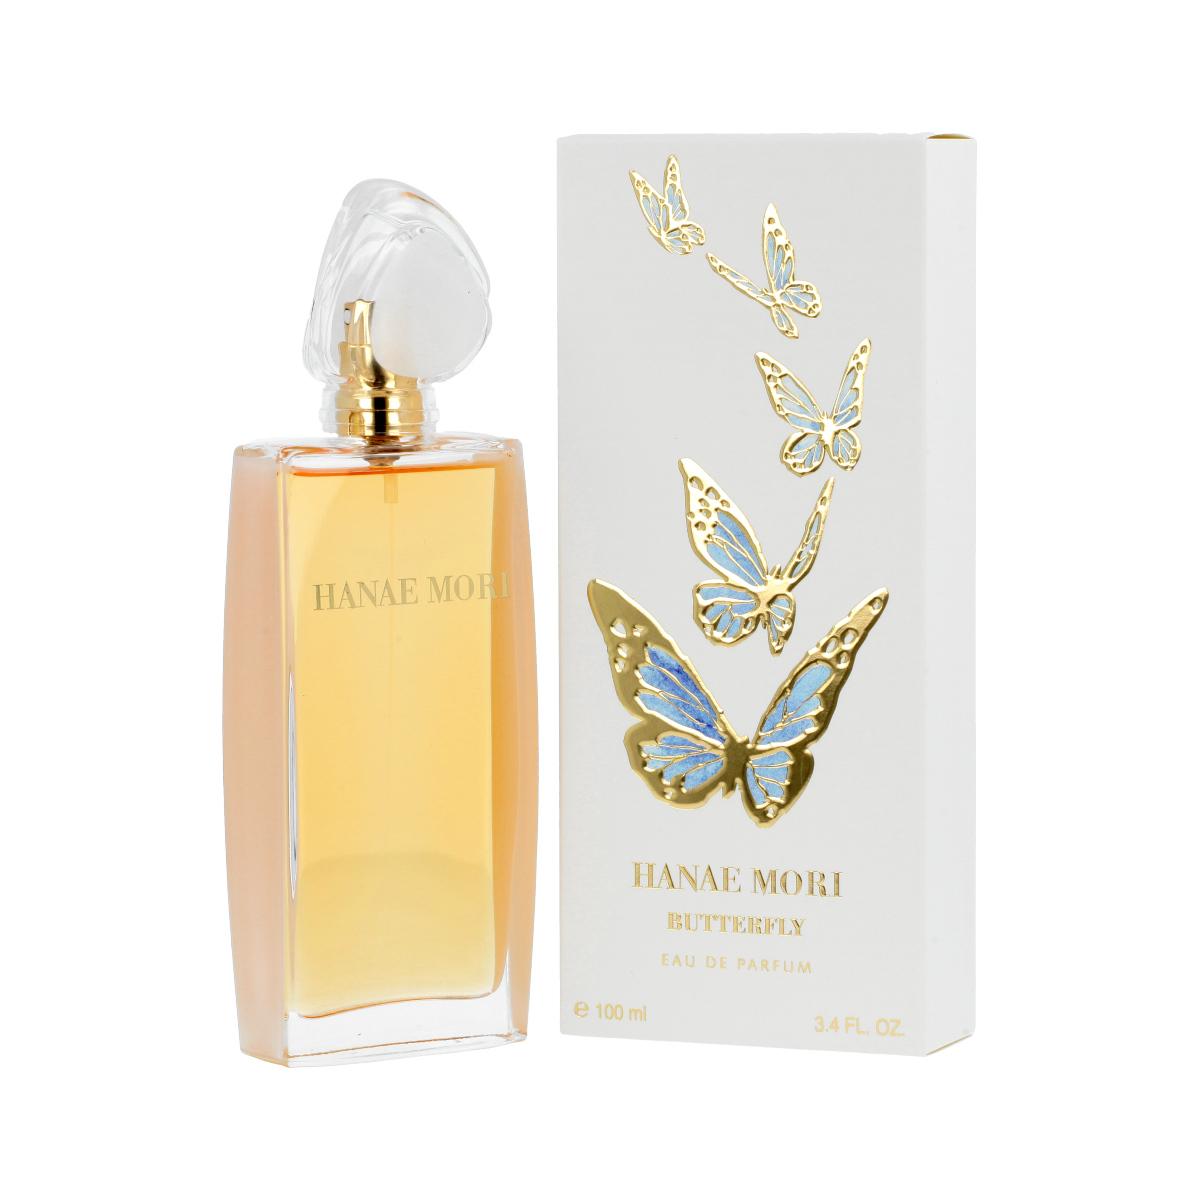 Hanae Mori Butterfly Eau De Parfum 100 ml (woman) 89183